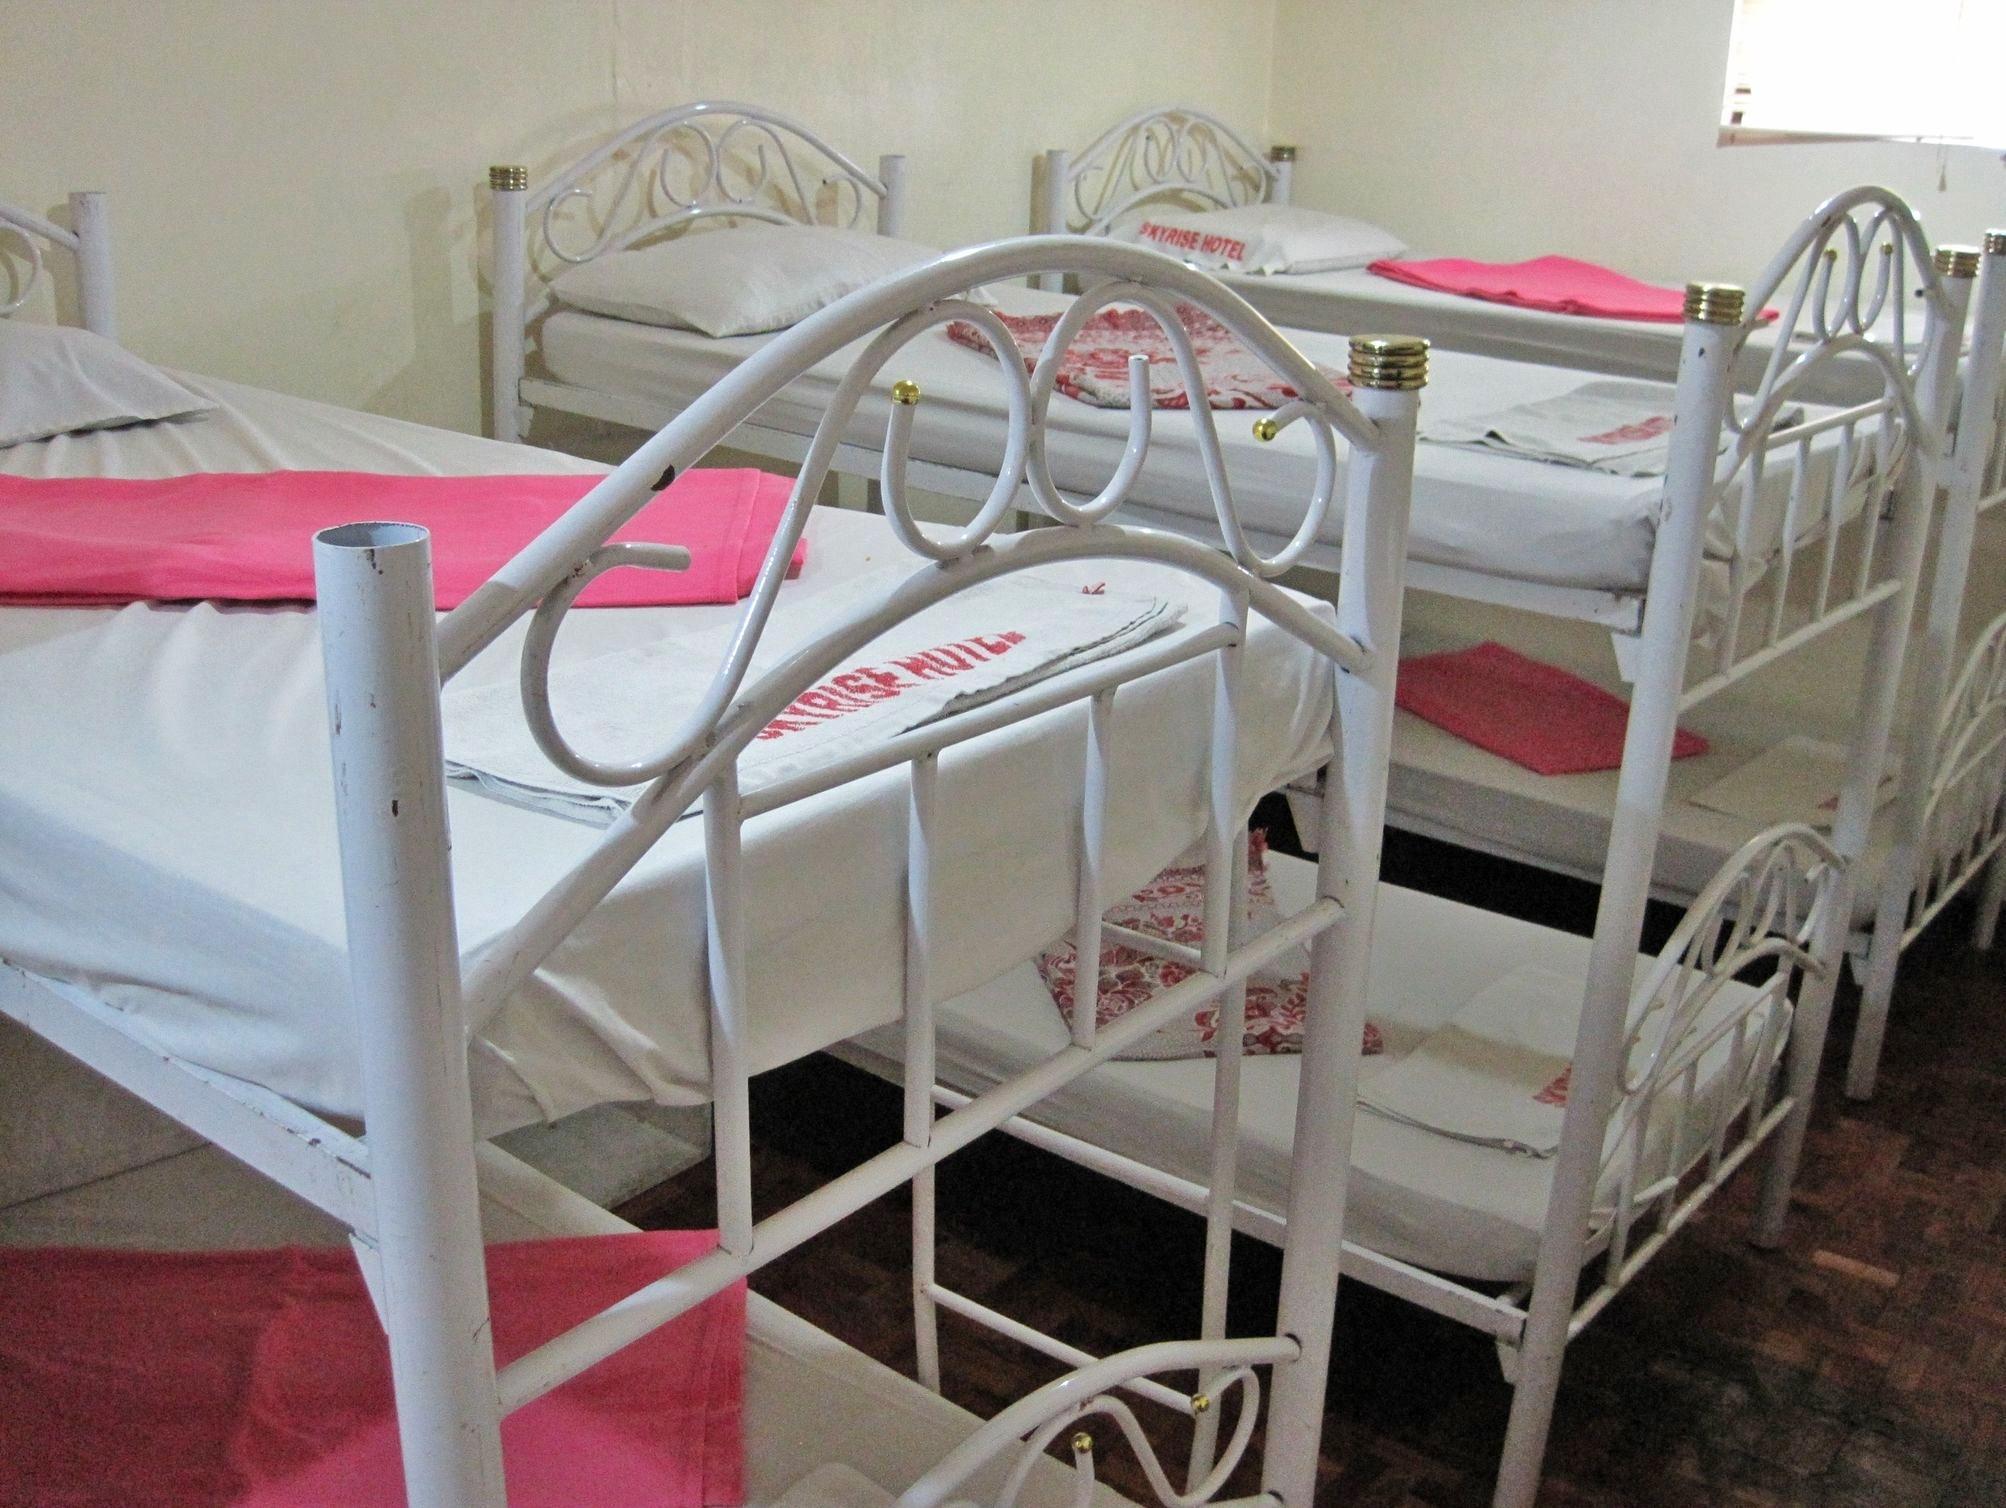 Skyrise Hotel in Baguio - Room Deals, Photos & Reviews